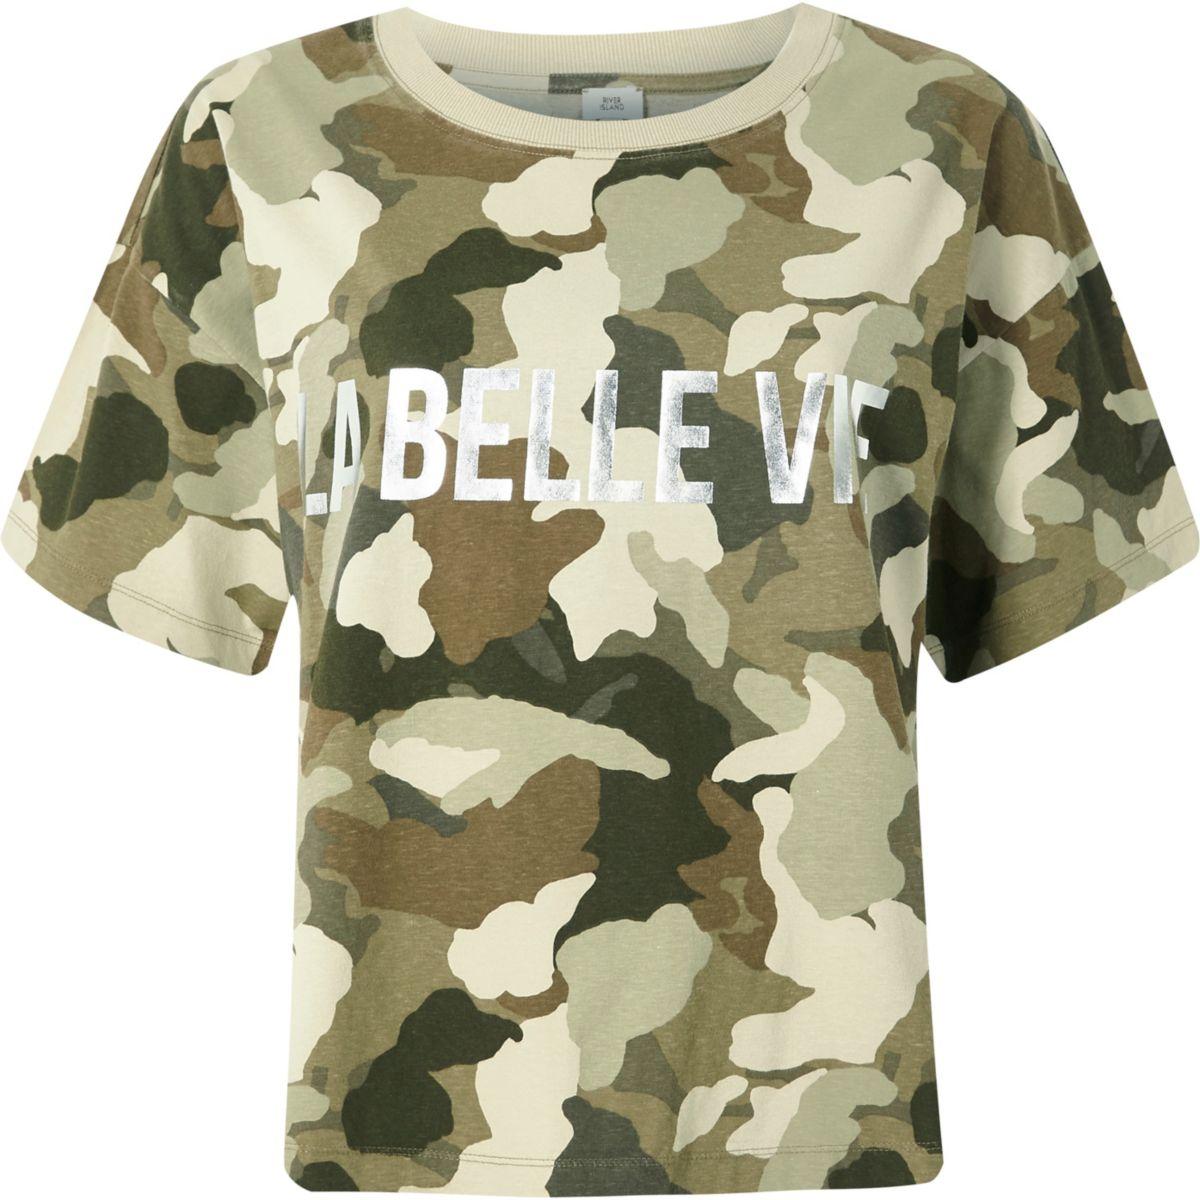 Khaki camo 'la belle vie' print T-shirt